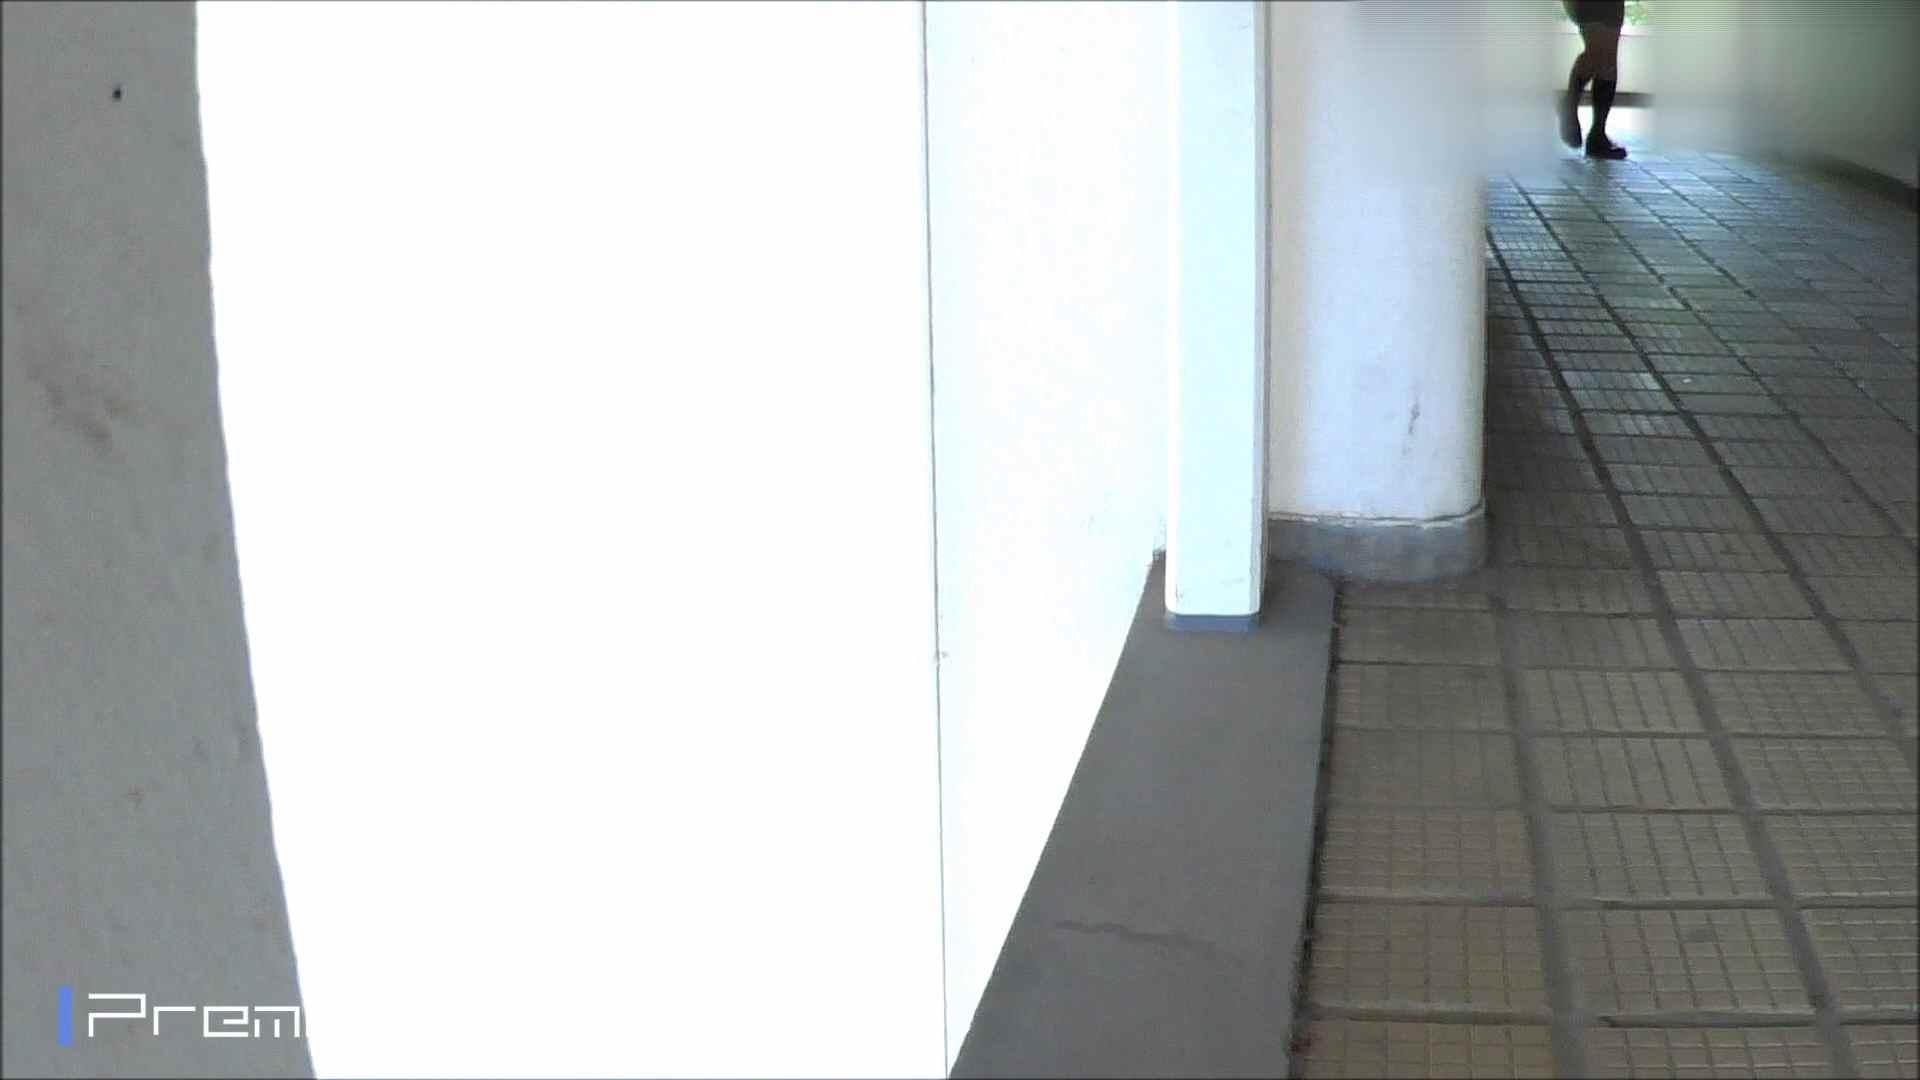 FHD激カワ!激やば! 復讐のトイレ盗撮 Vol.03 名作殿堂  78PIX 51